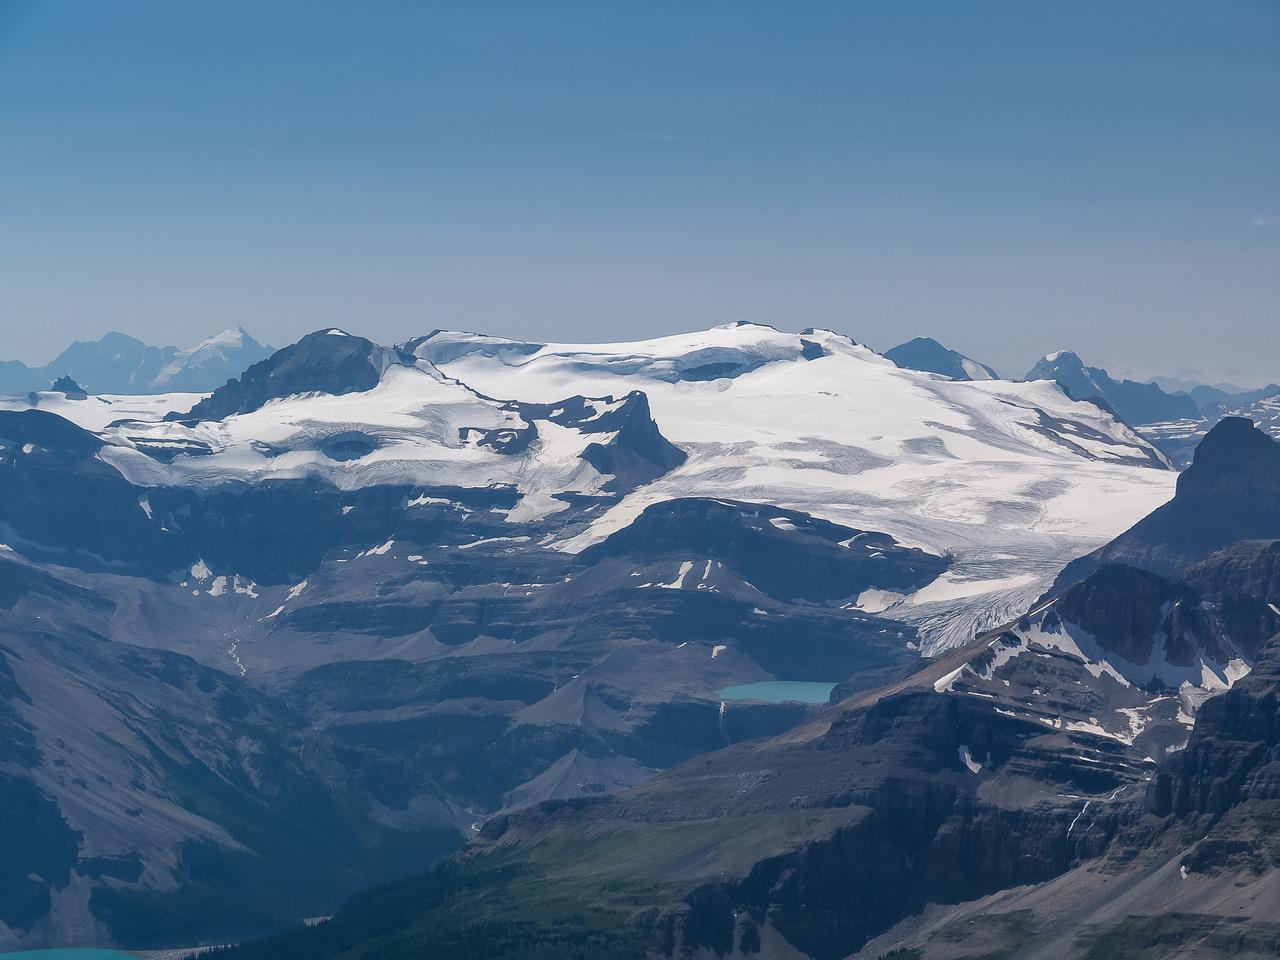 Views over Iceberg Lake towards Mount Gordon and Olive (L).